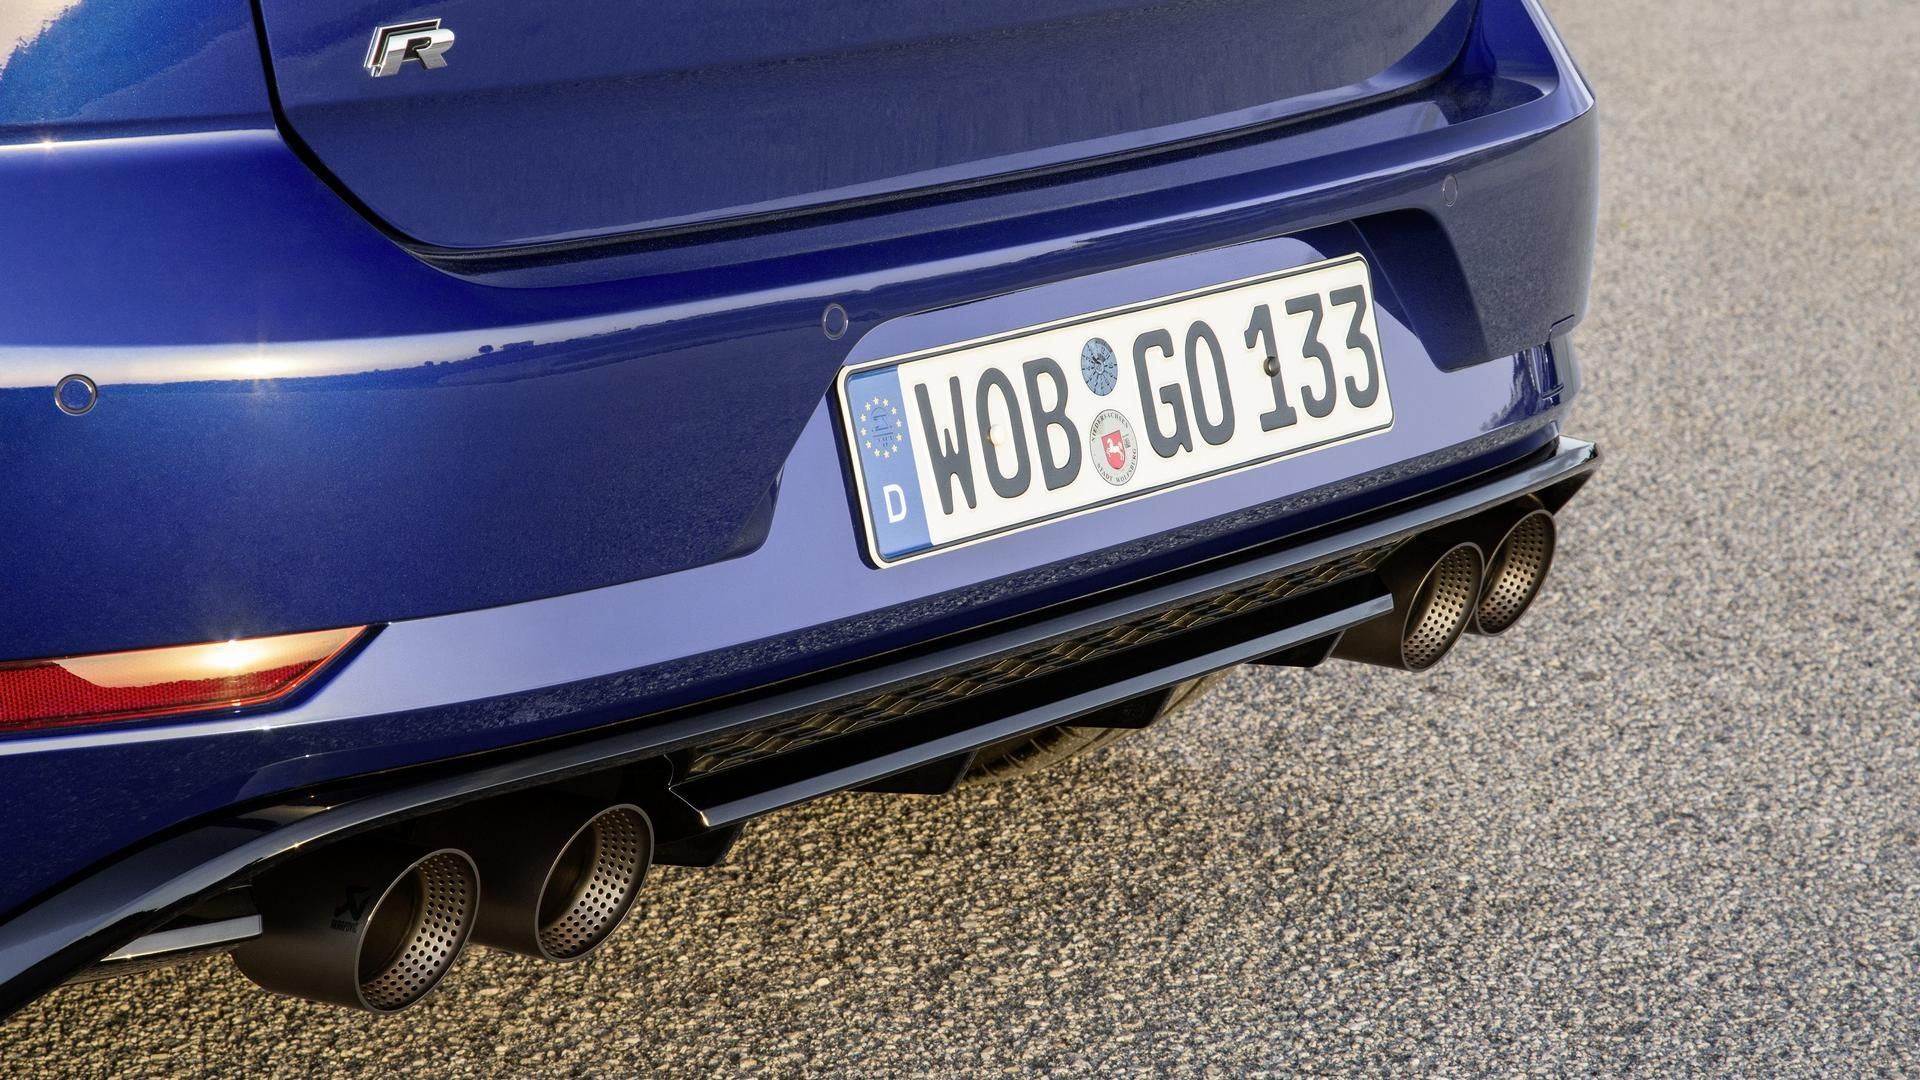 Vw Golf R Performance Pack Has Akrapovic Exhaust Lighter Brakes Volkswagen Golf Gti Volkswagen Golf Volkswagen Golf R